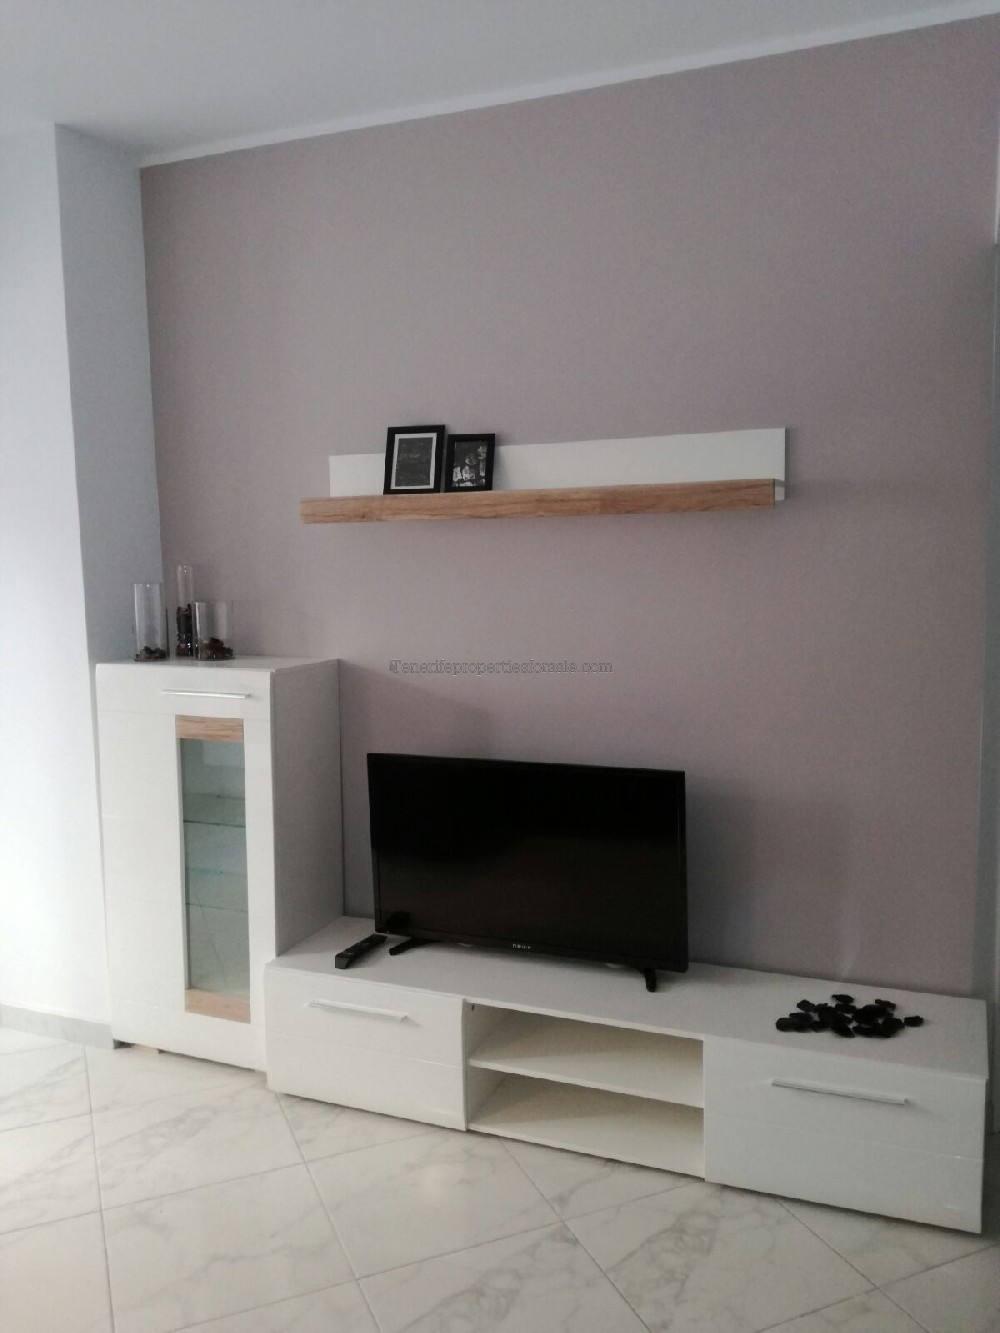 A20119 Apartment